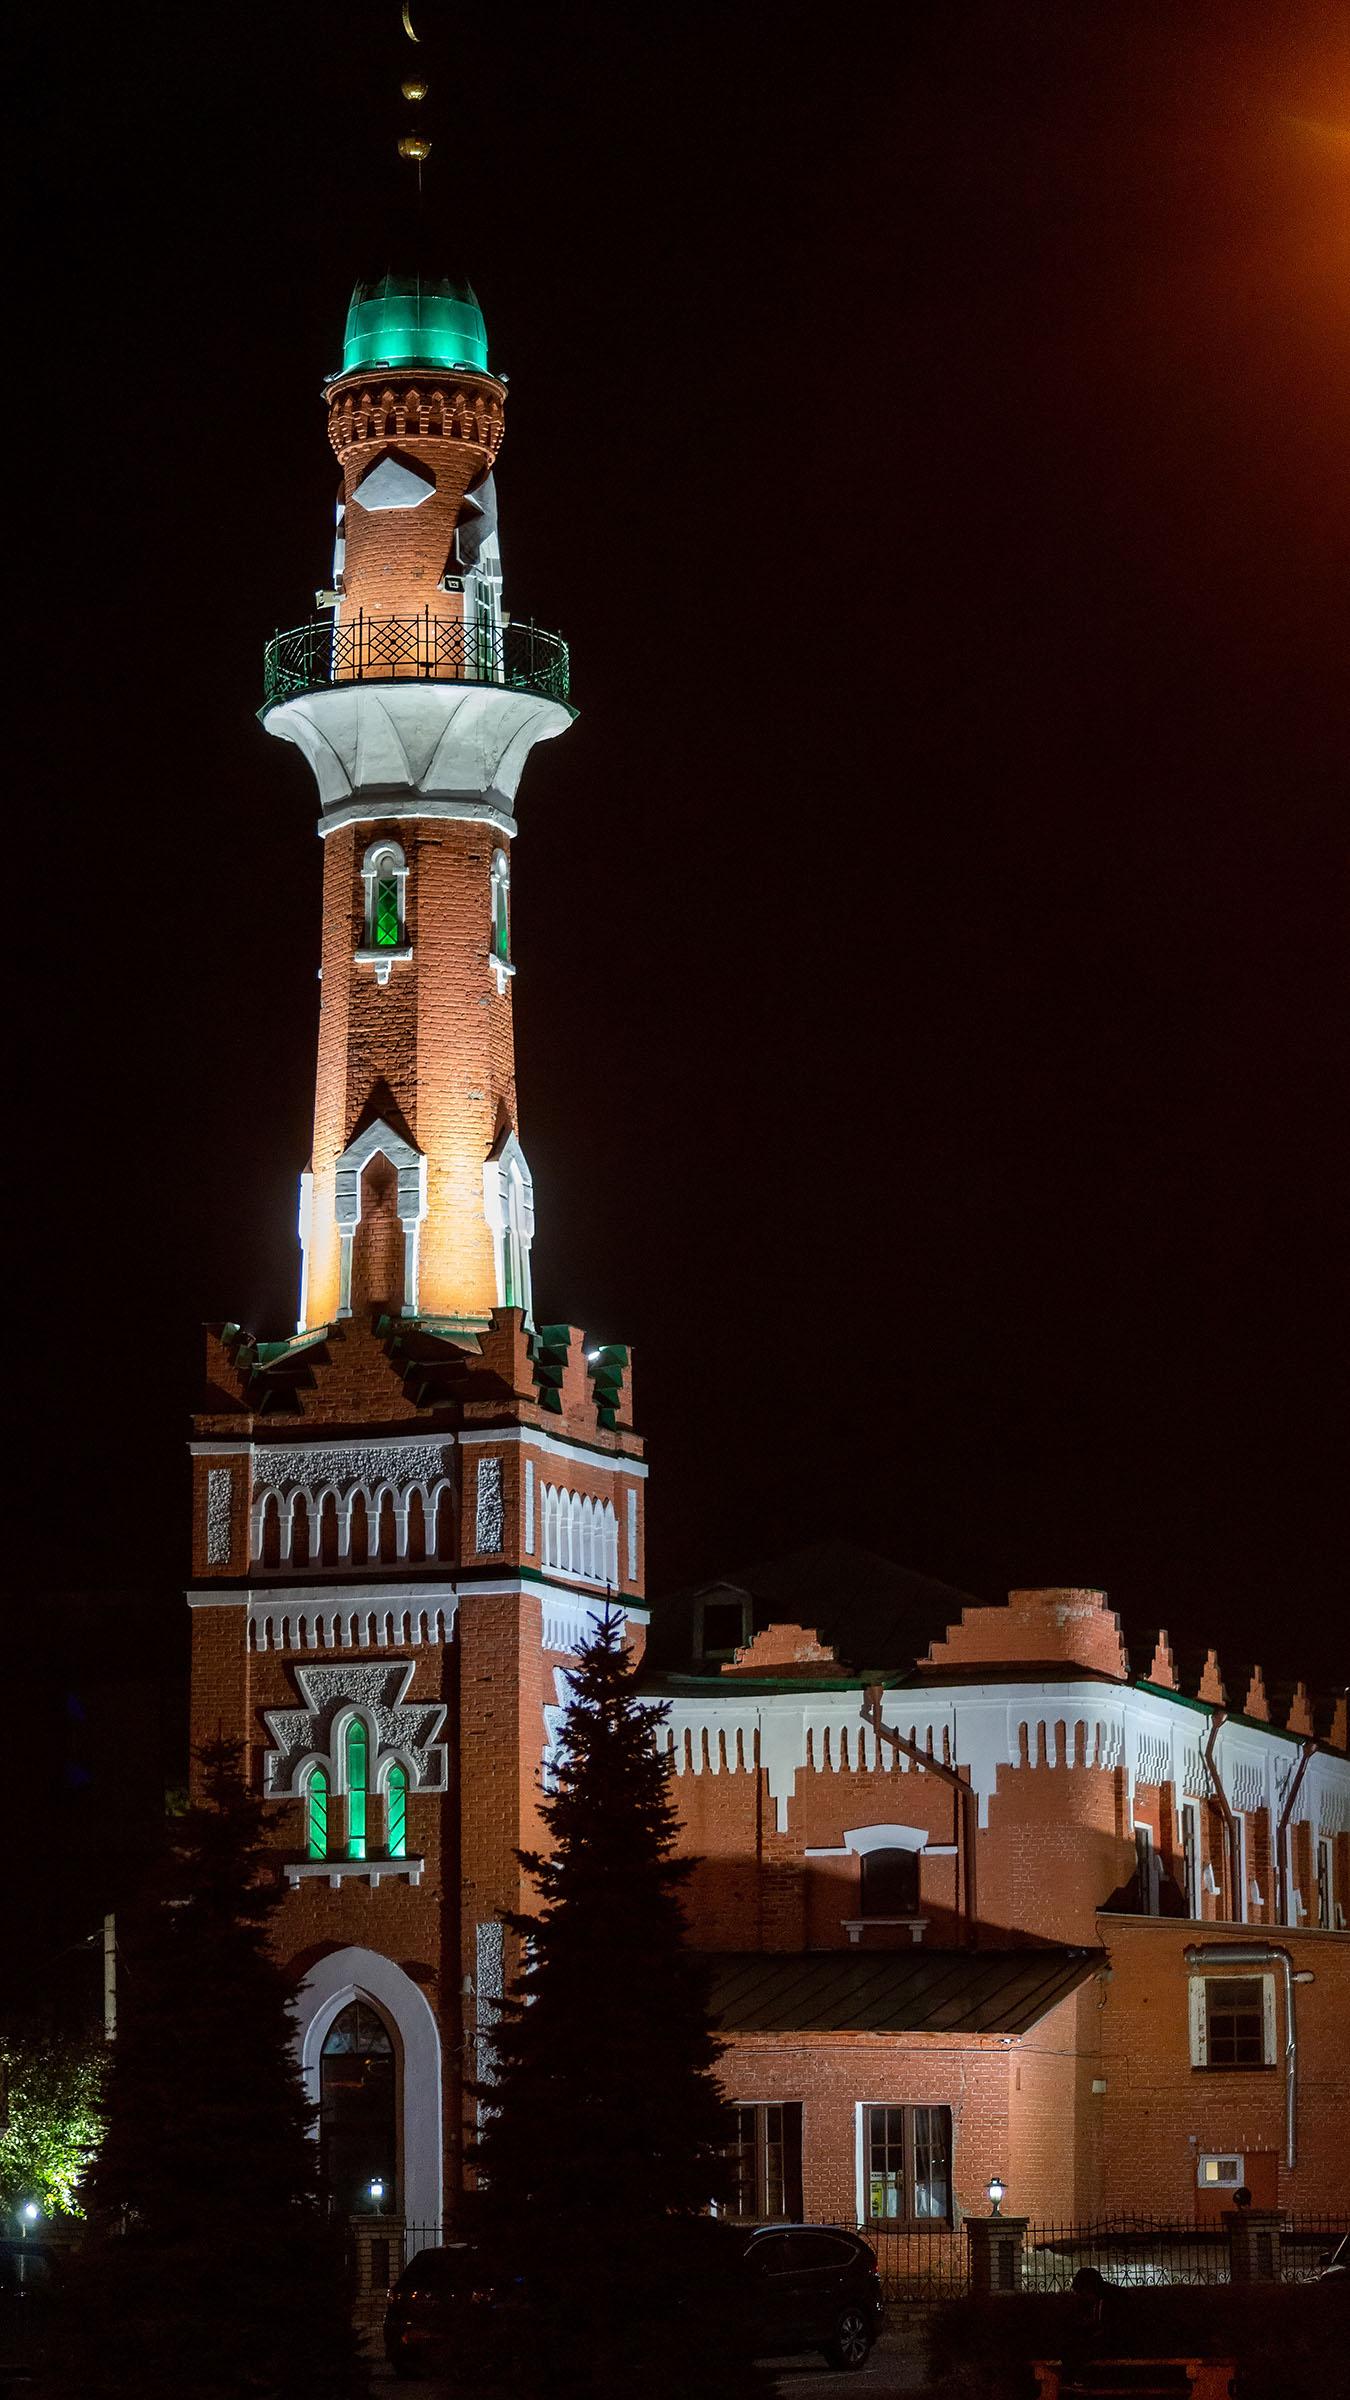 Закабанная мечеть. Вечер, Казань::Ночная прогулка по Казани